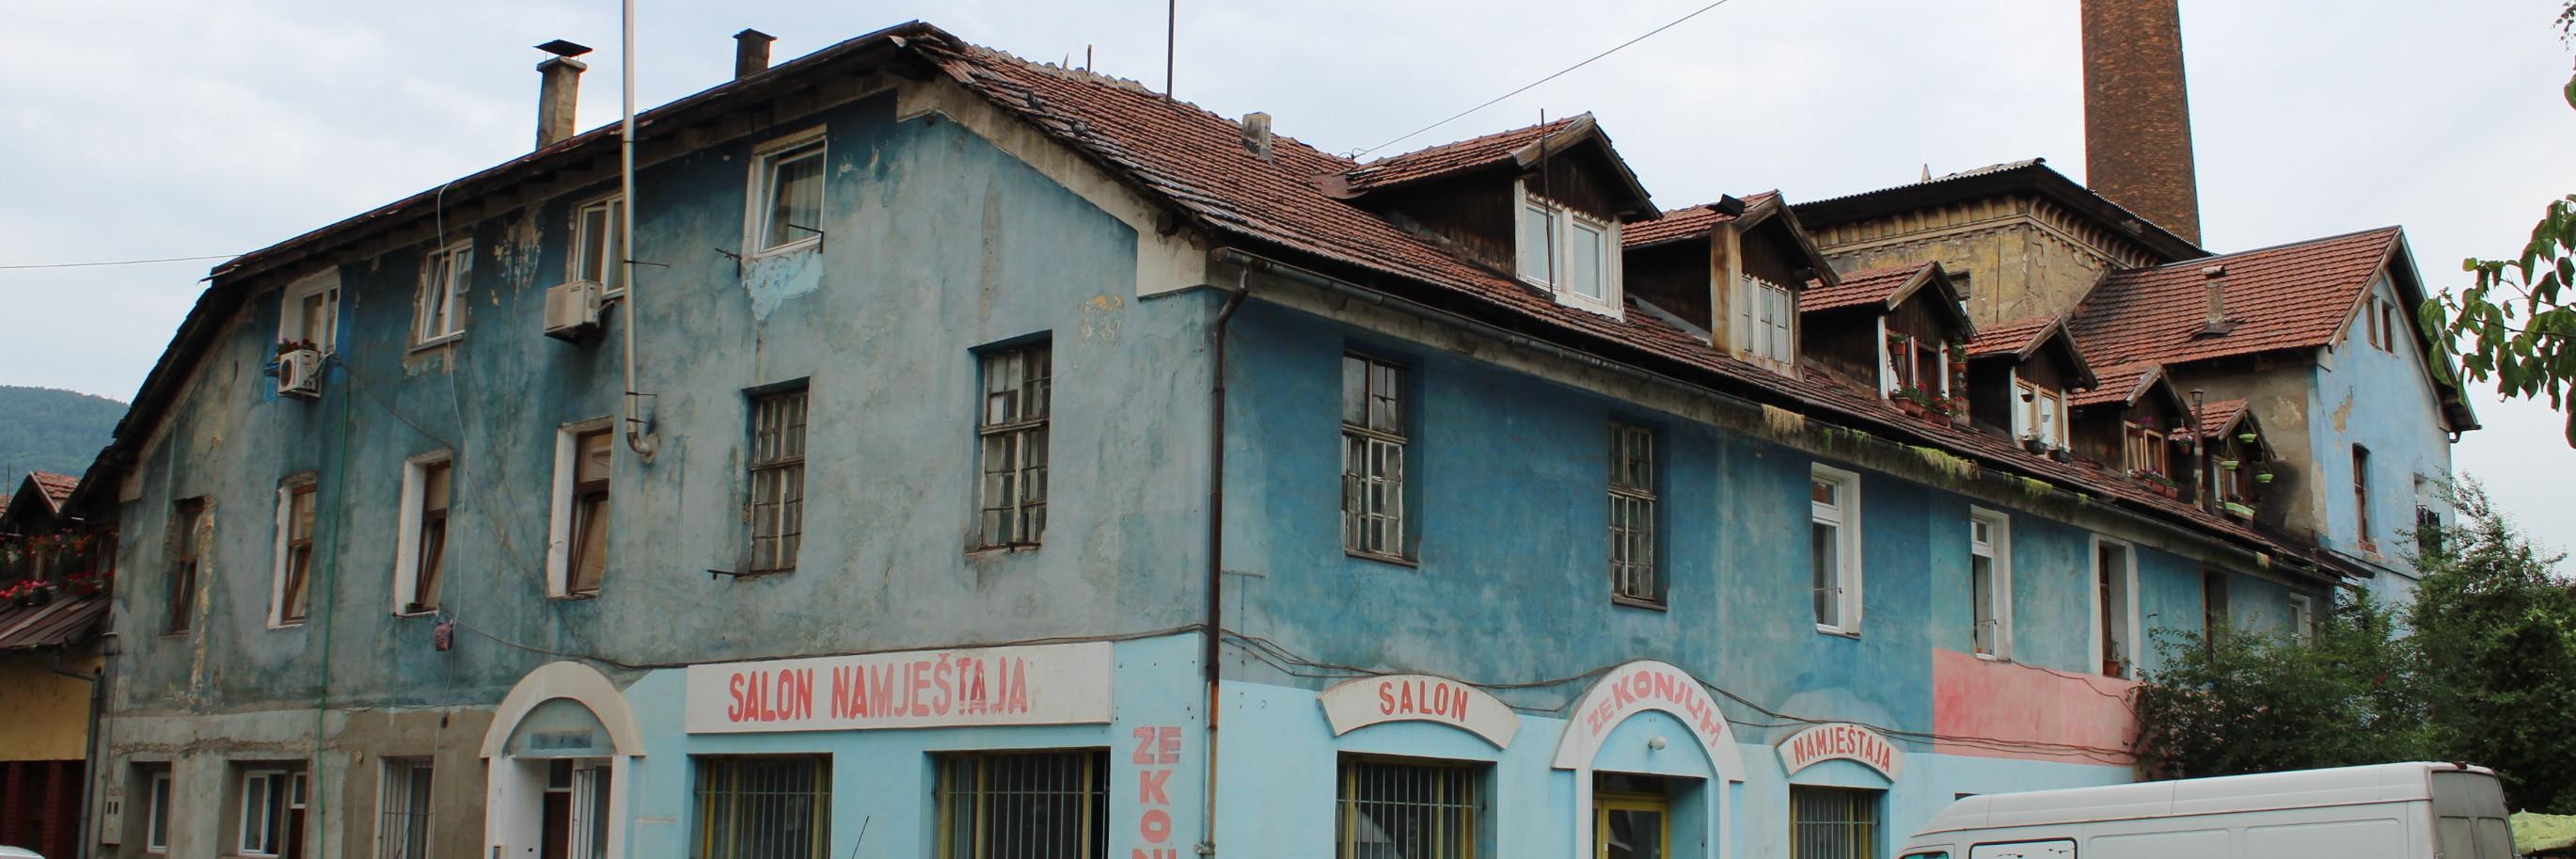 Бывшая бумажная фабрика. Фото: Елена Арсениевич, CC BY-SA 3.0